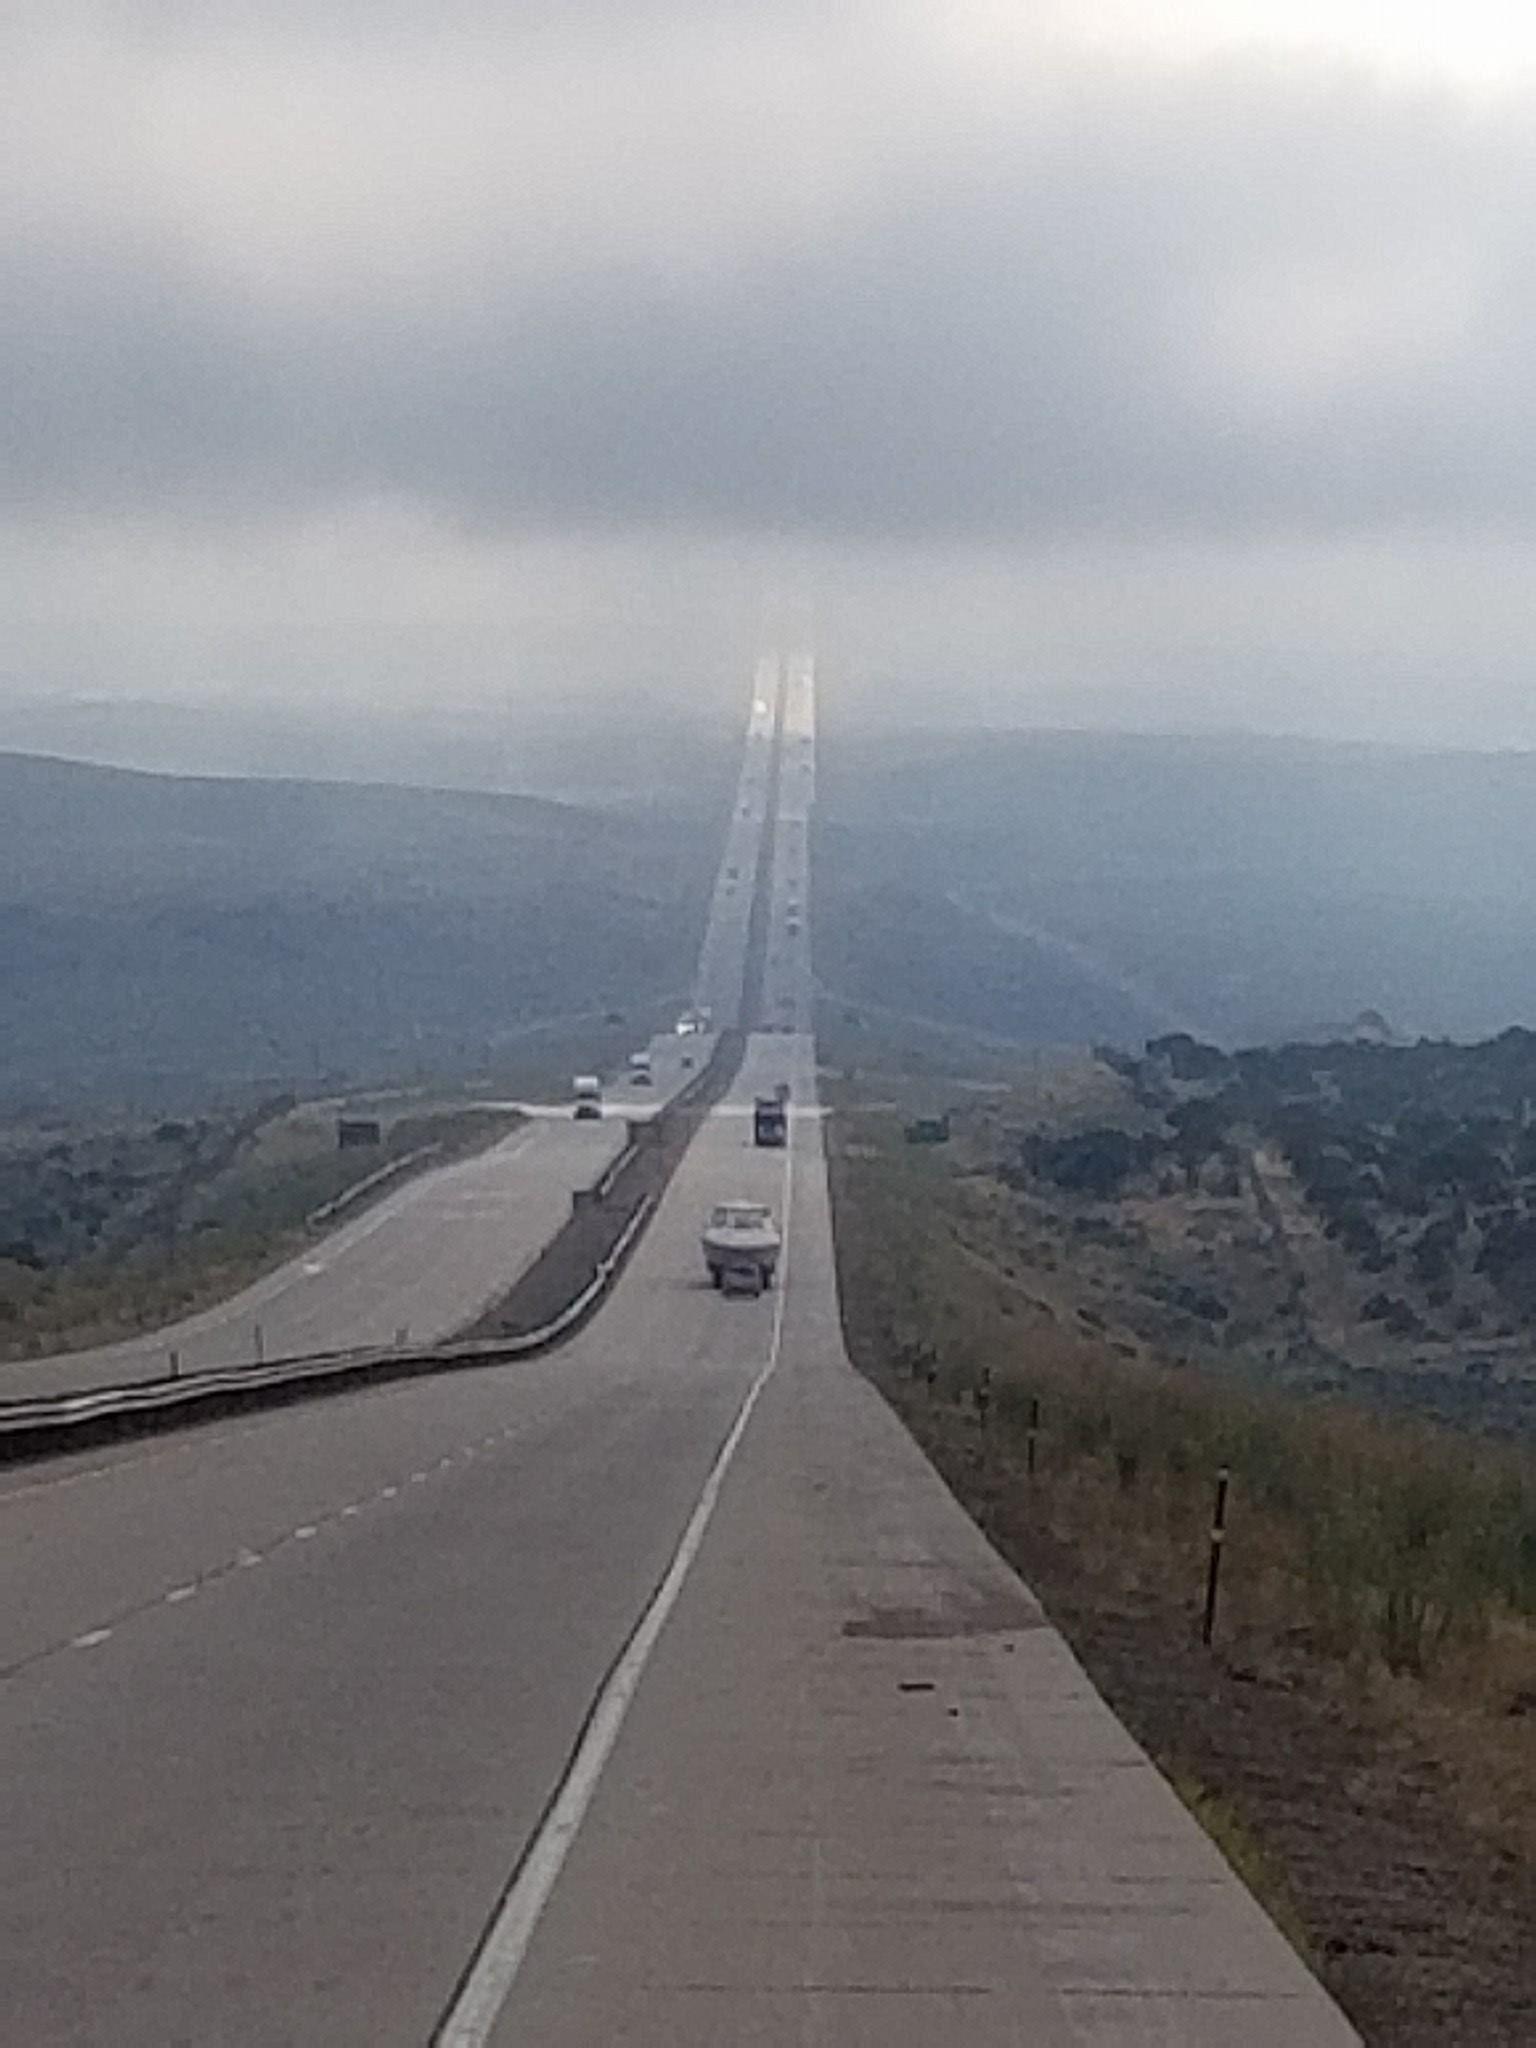 29ef18a4a461c05414994c69dd4b3584 - How Long Does It Take To Get To Wyoming